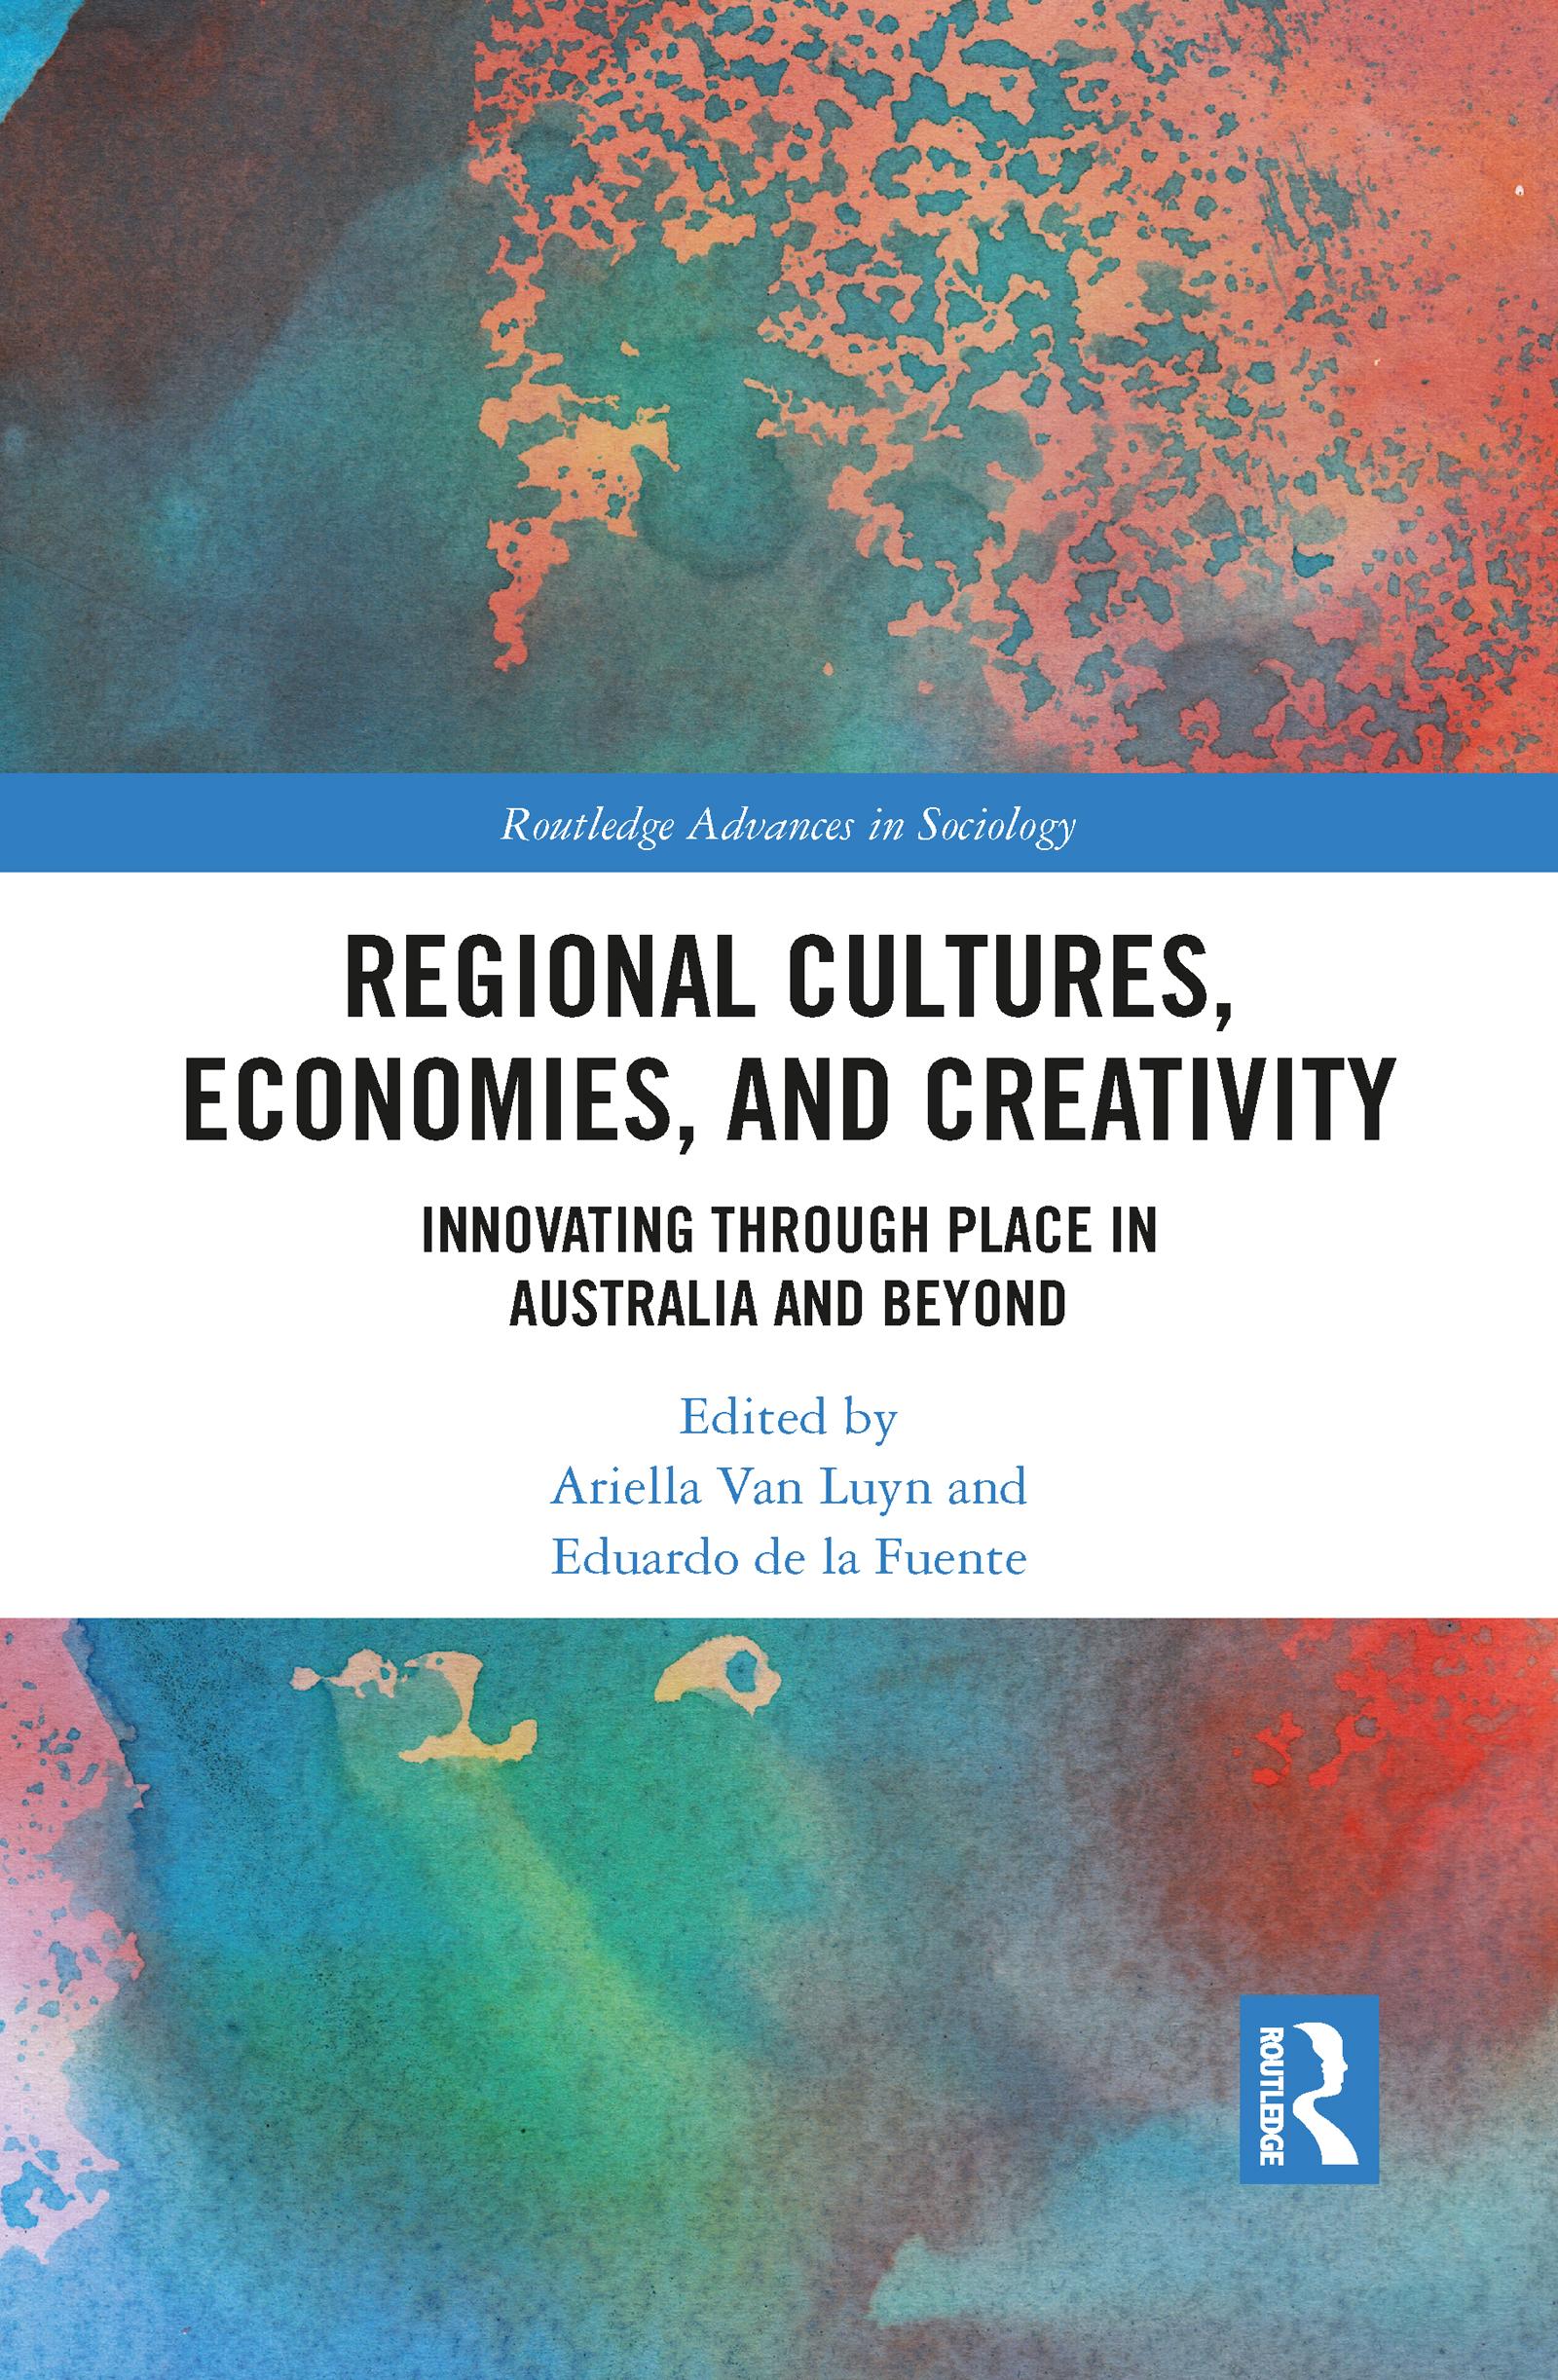 Regional Cultures, Economies, and Creativity